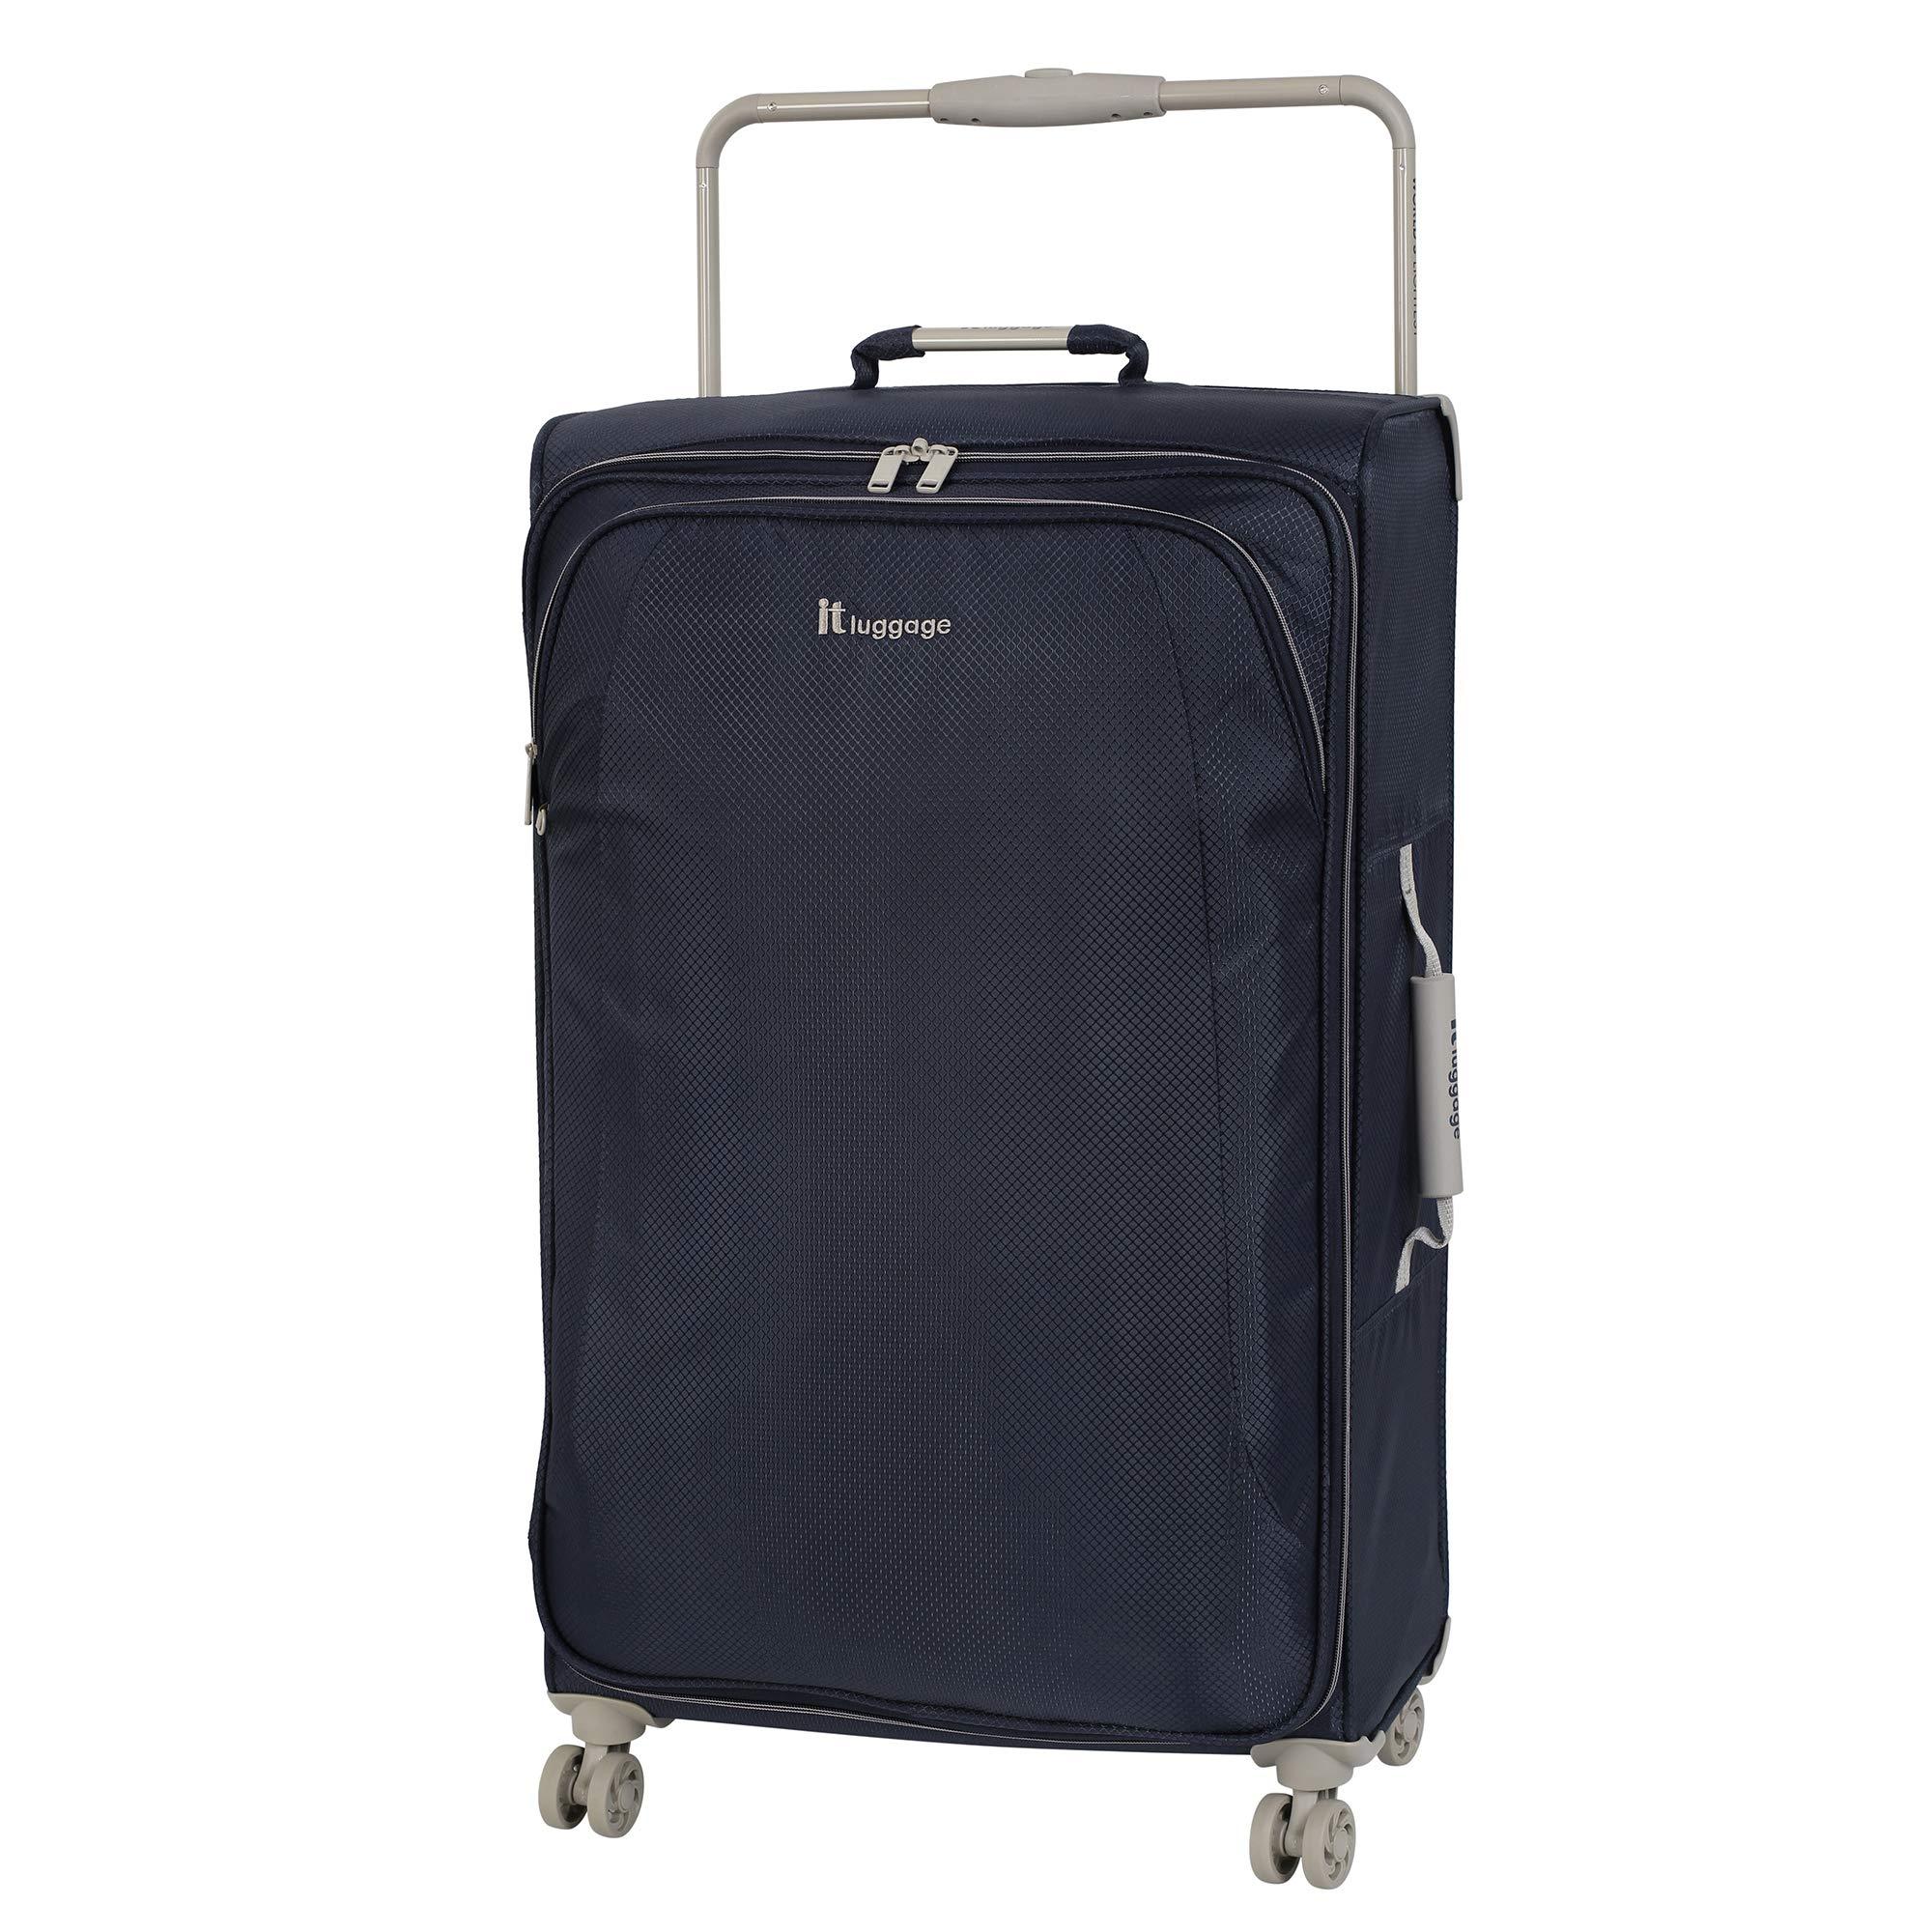 IT Luggage 31.5'' World's Lightest 8 Wheel Spinner, Magnet With Cobblestone Trim